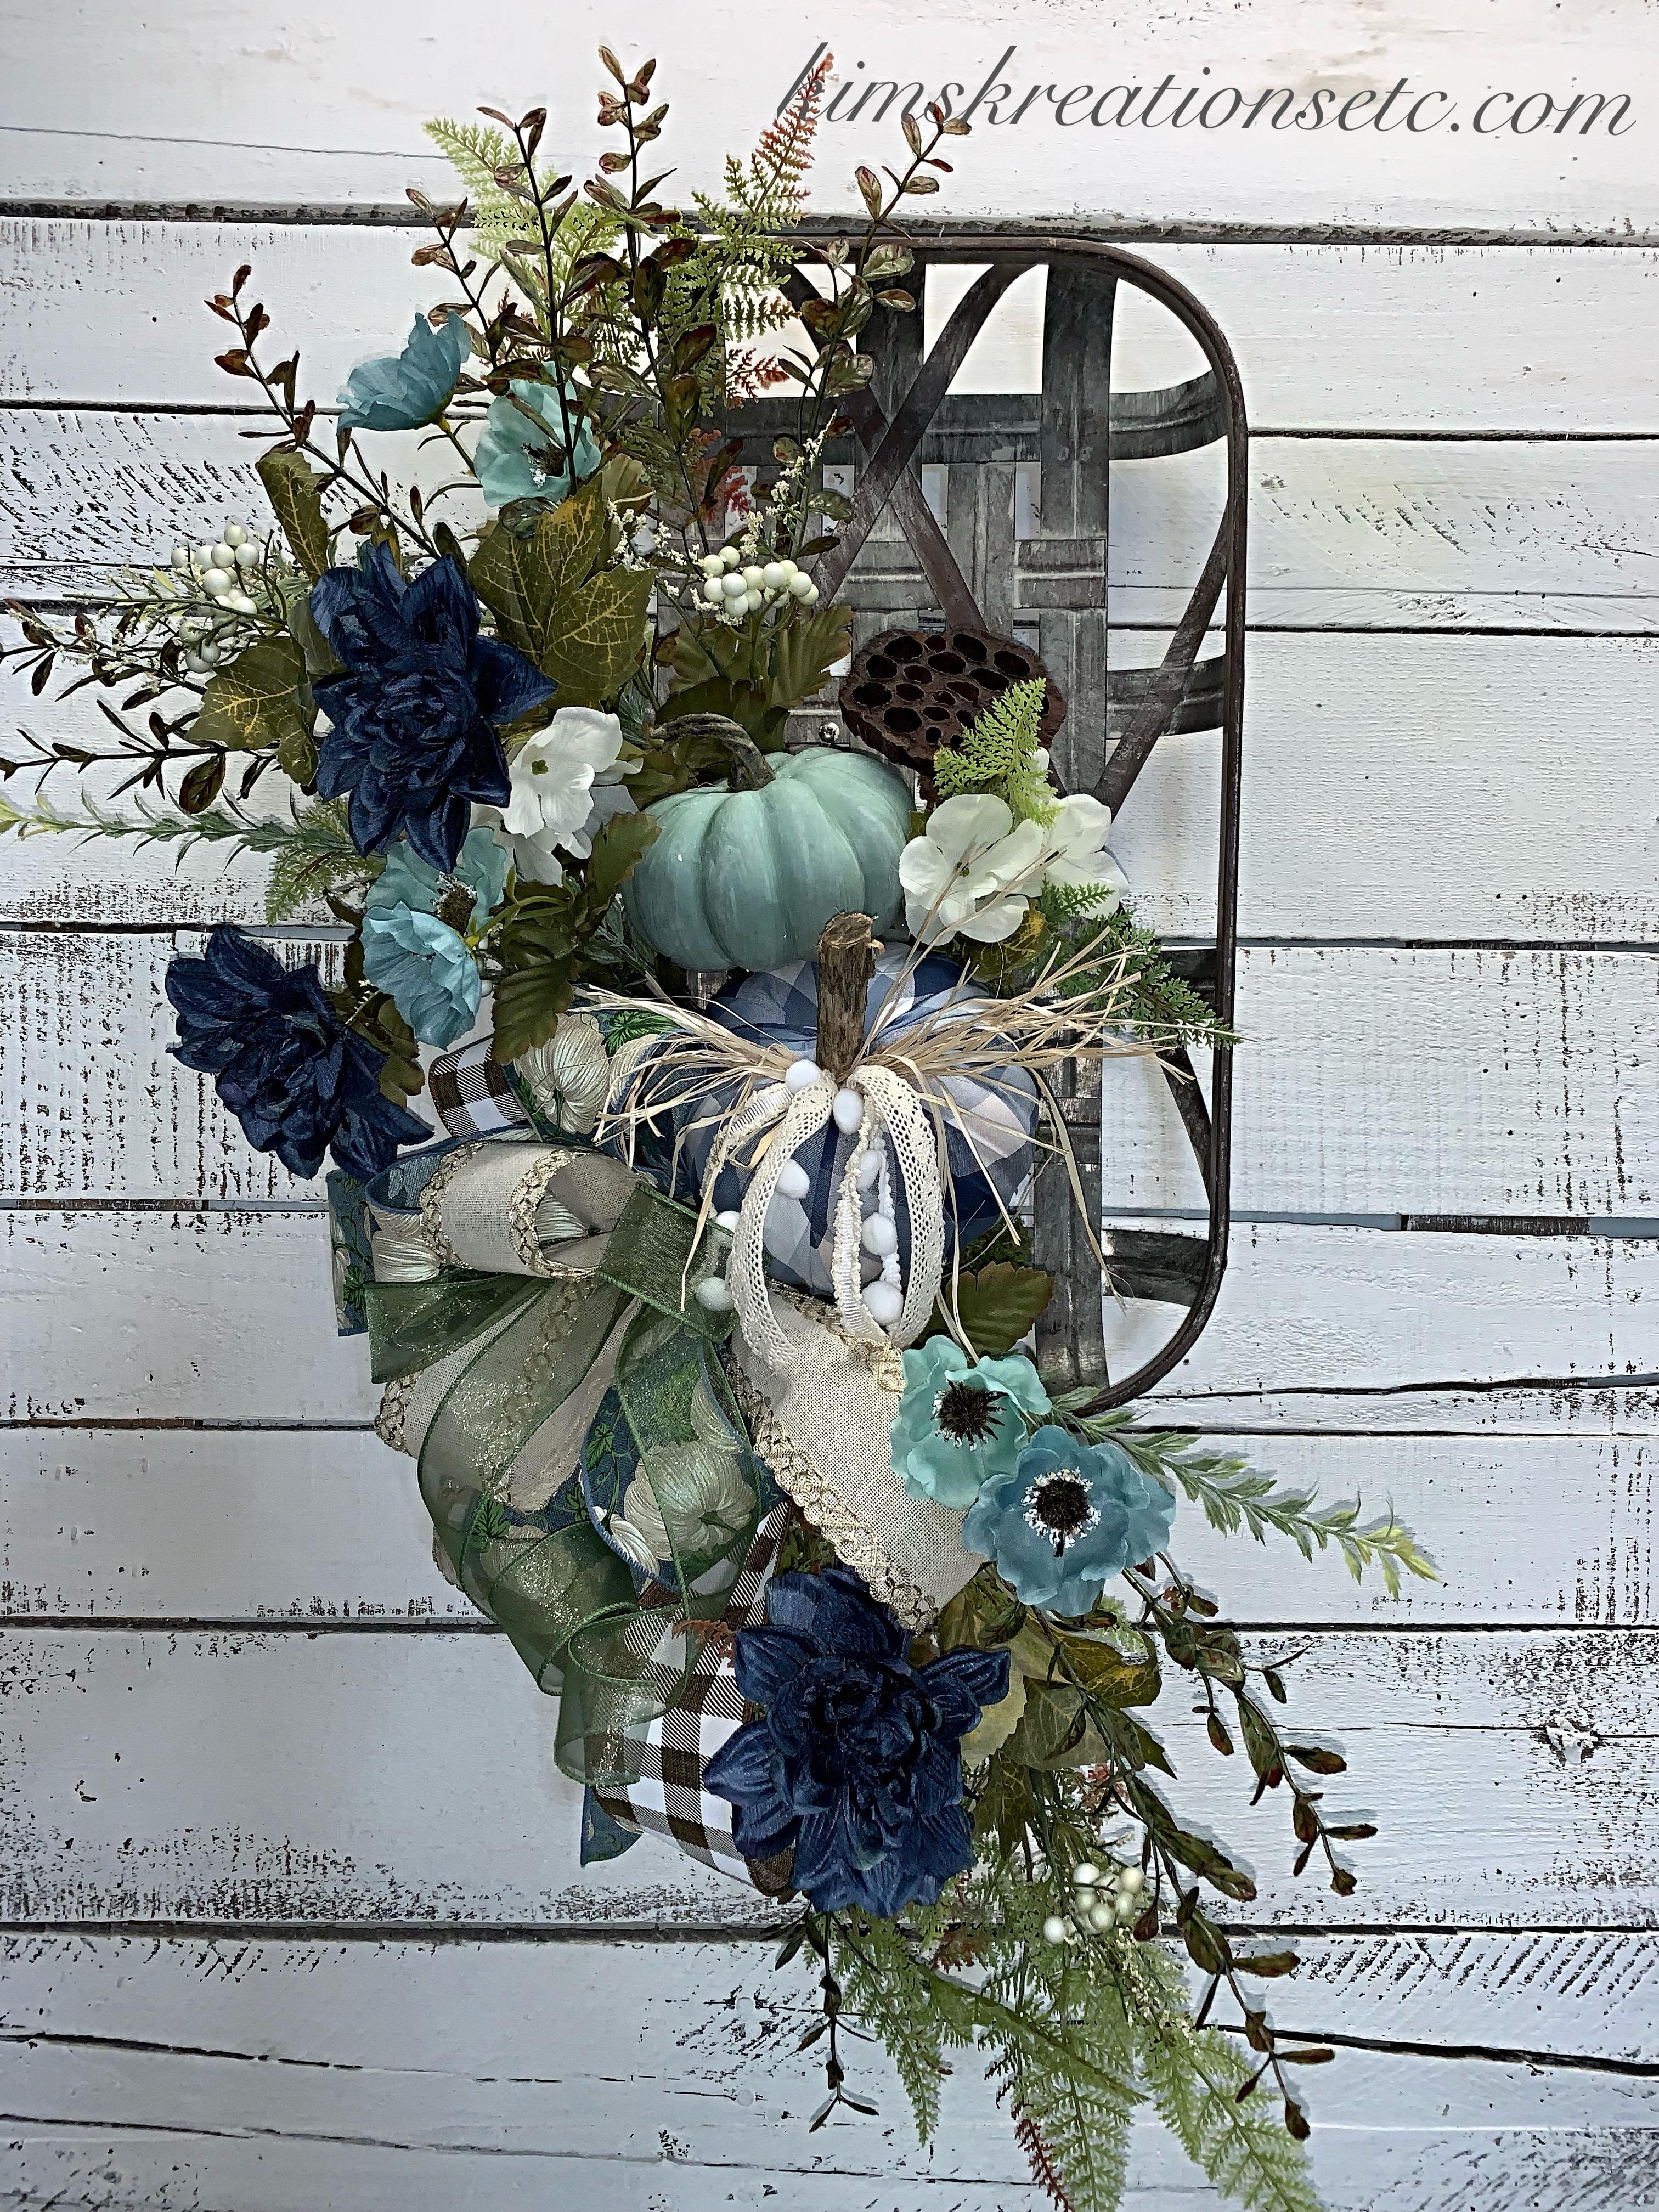 Fall Decor Fall Wreath Fall Tobacco Basket Farmhouse Decor Farmhouse Tobacco Basket For Fall Blue Pumpkins For Fall Blue And Teal Home Decor Blue Plaid Pumpkin Wreaths For Sale One Of A